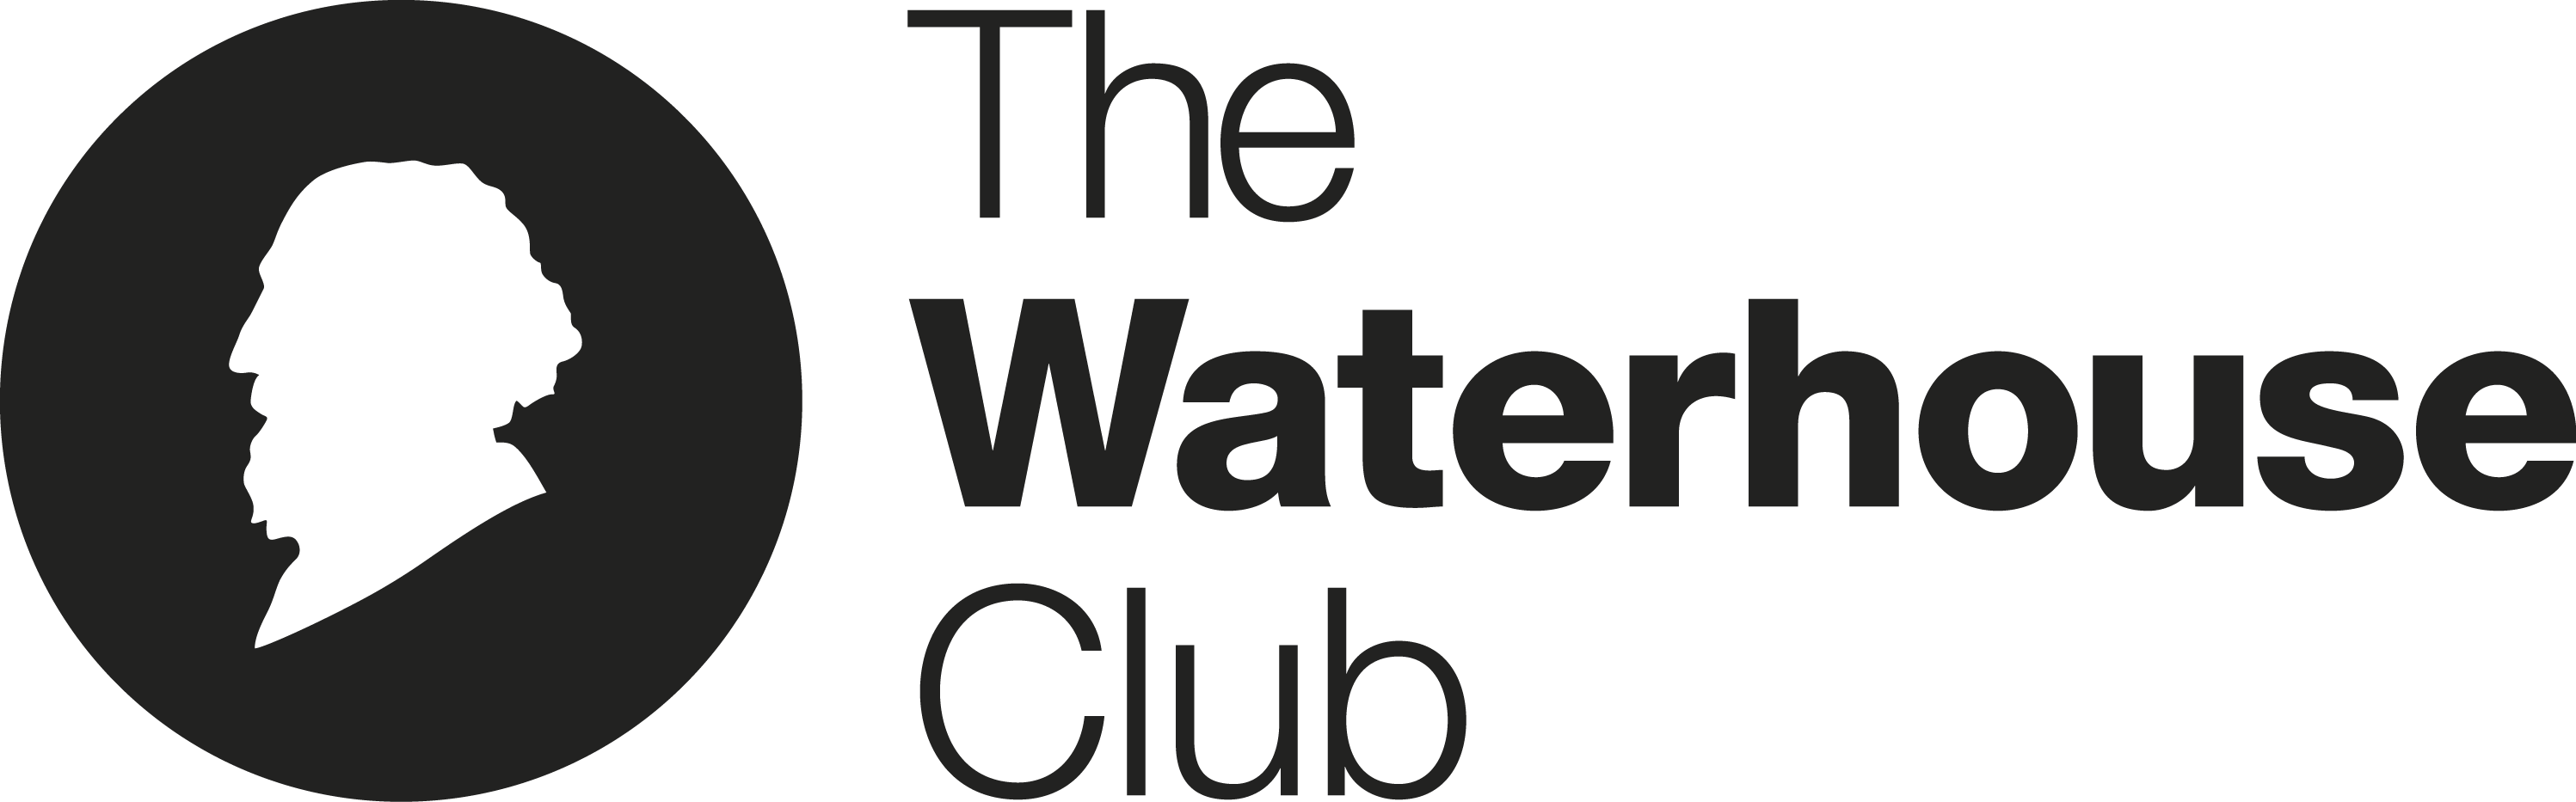 The Waterhouse Club